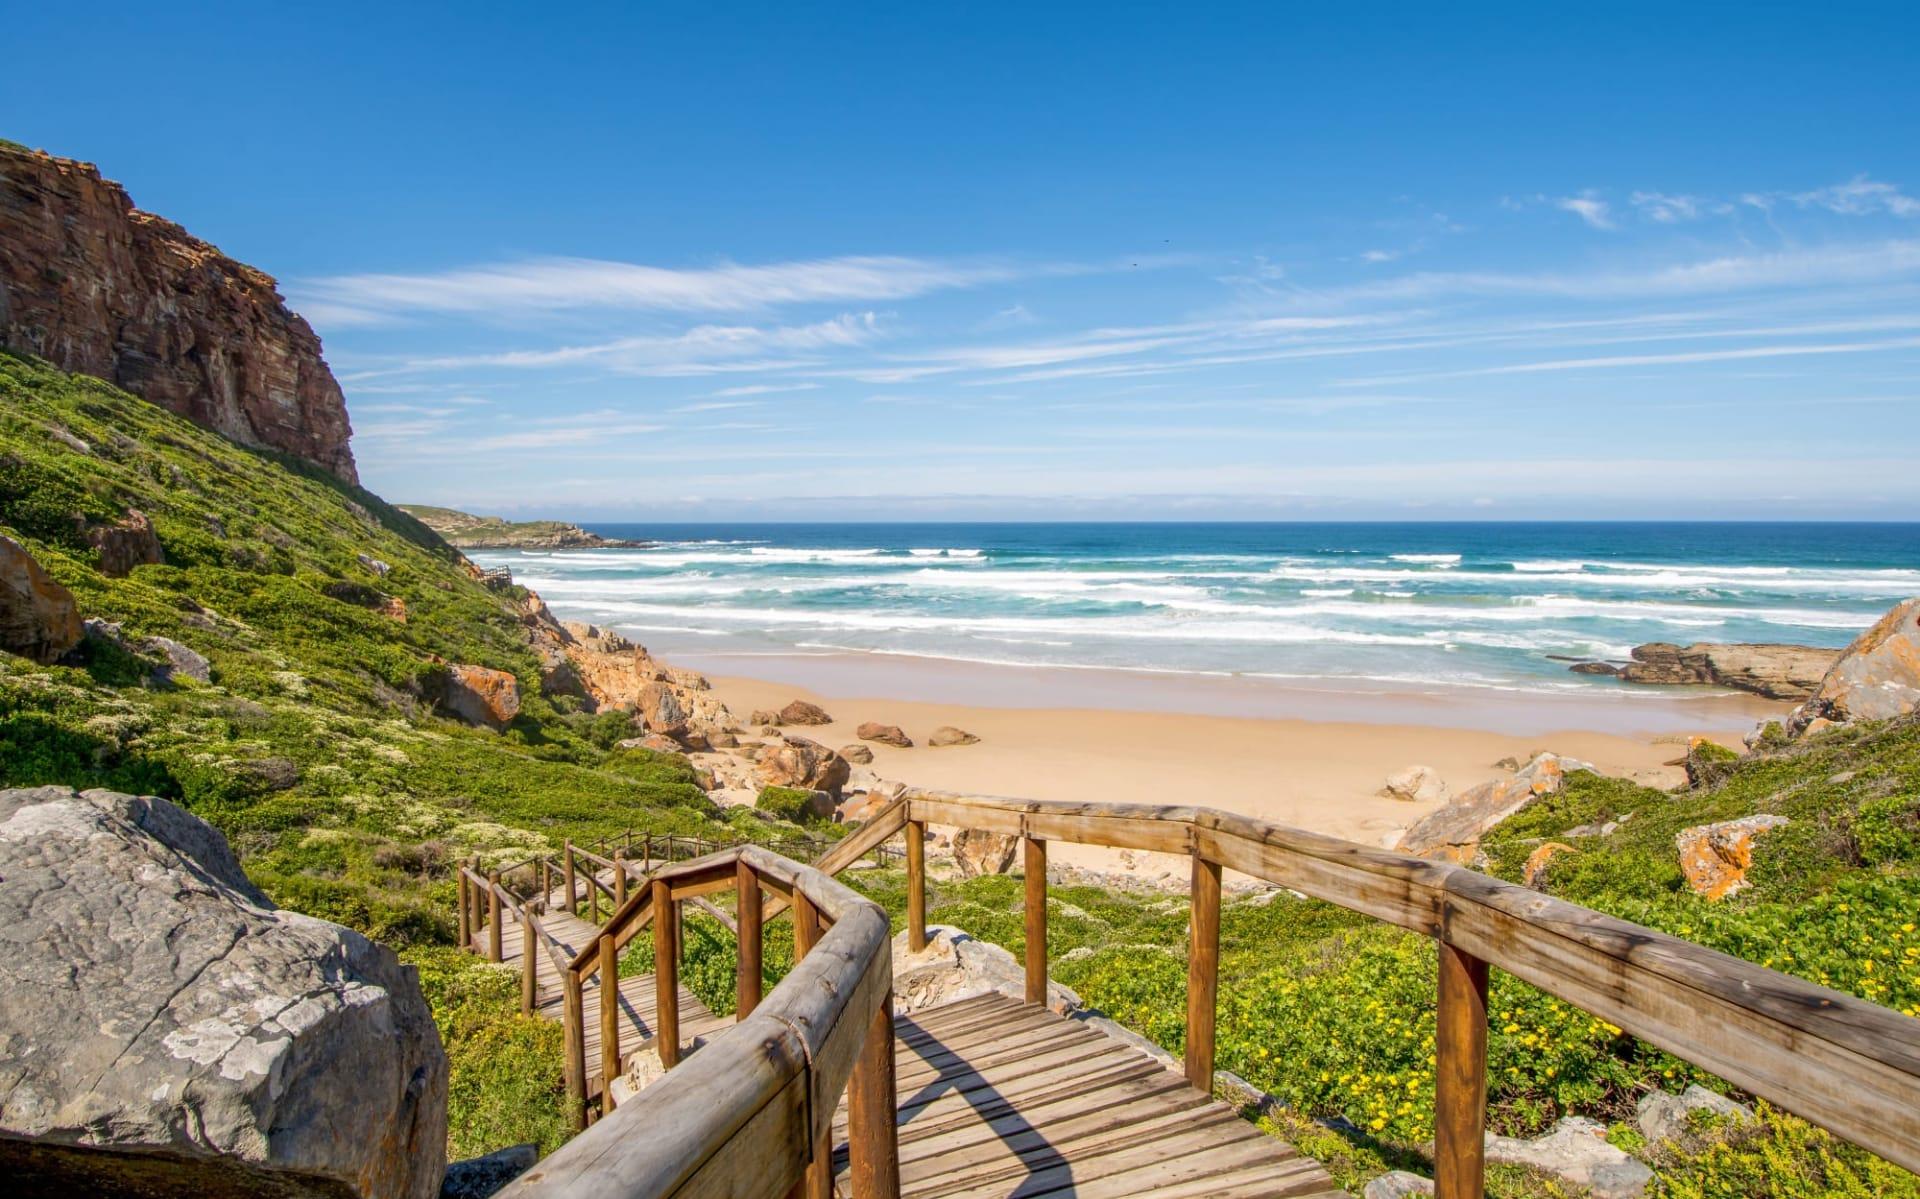 Südafrika Klassiker Privatreise ab Johannesburg: Südafrika - Plettenberg Bay - Robberg Beach